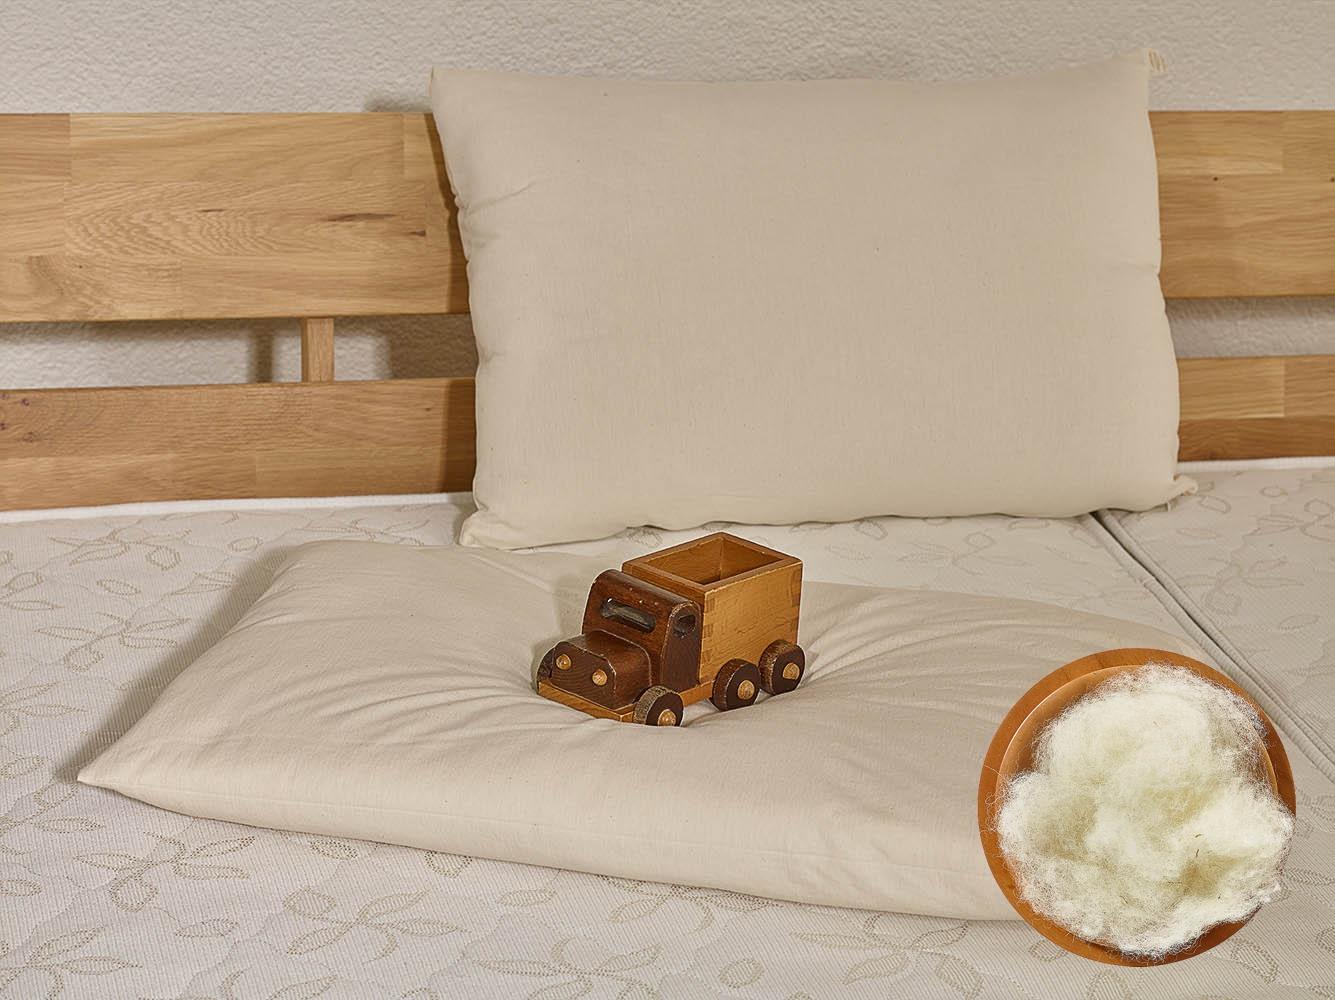 woll kissen 40x60 cm frau wolle schafwollprodukte. Black Bedroom Furniture Sets. Home Design Ideas